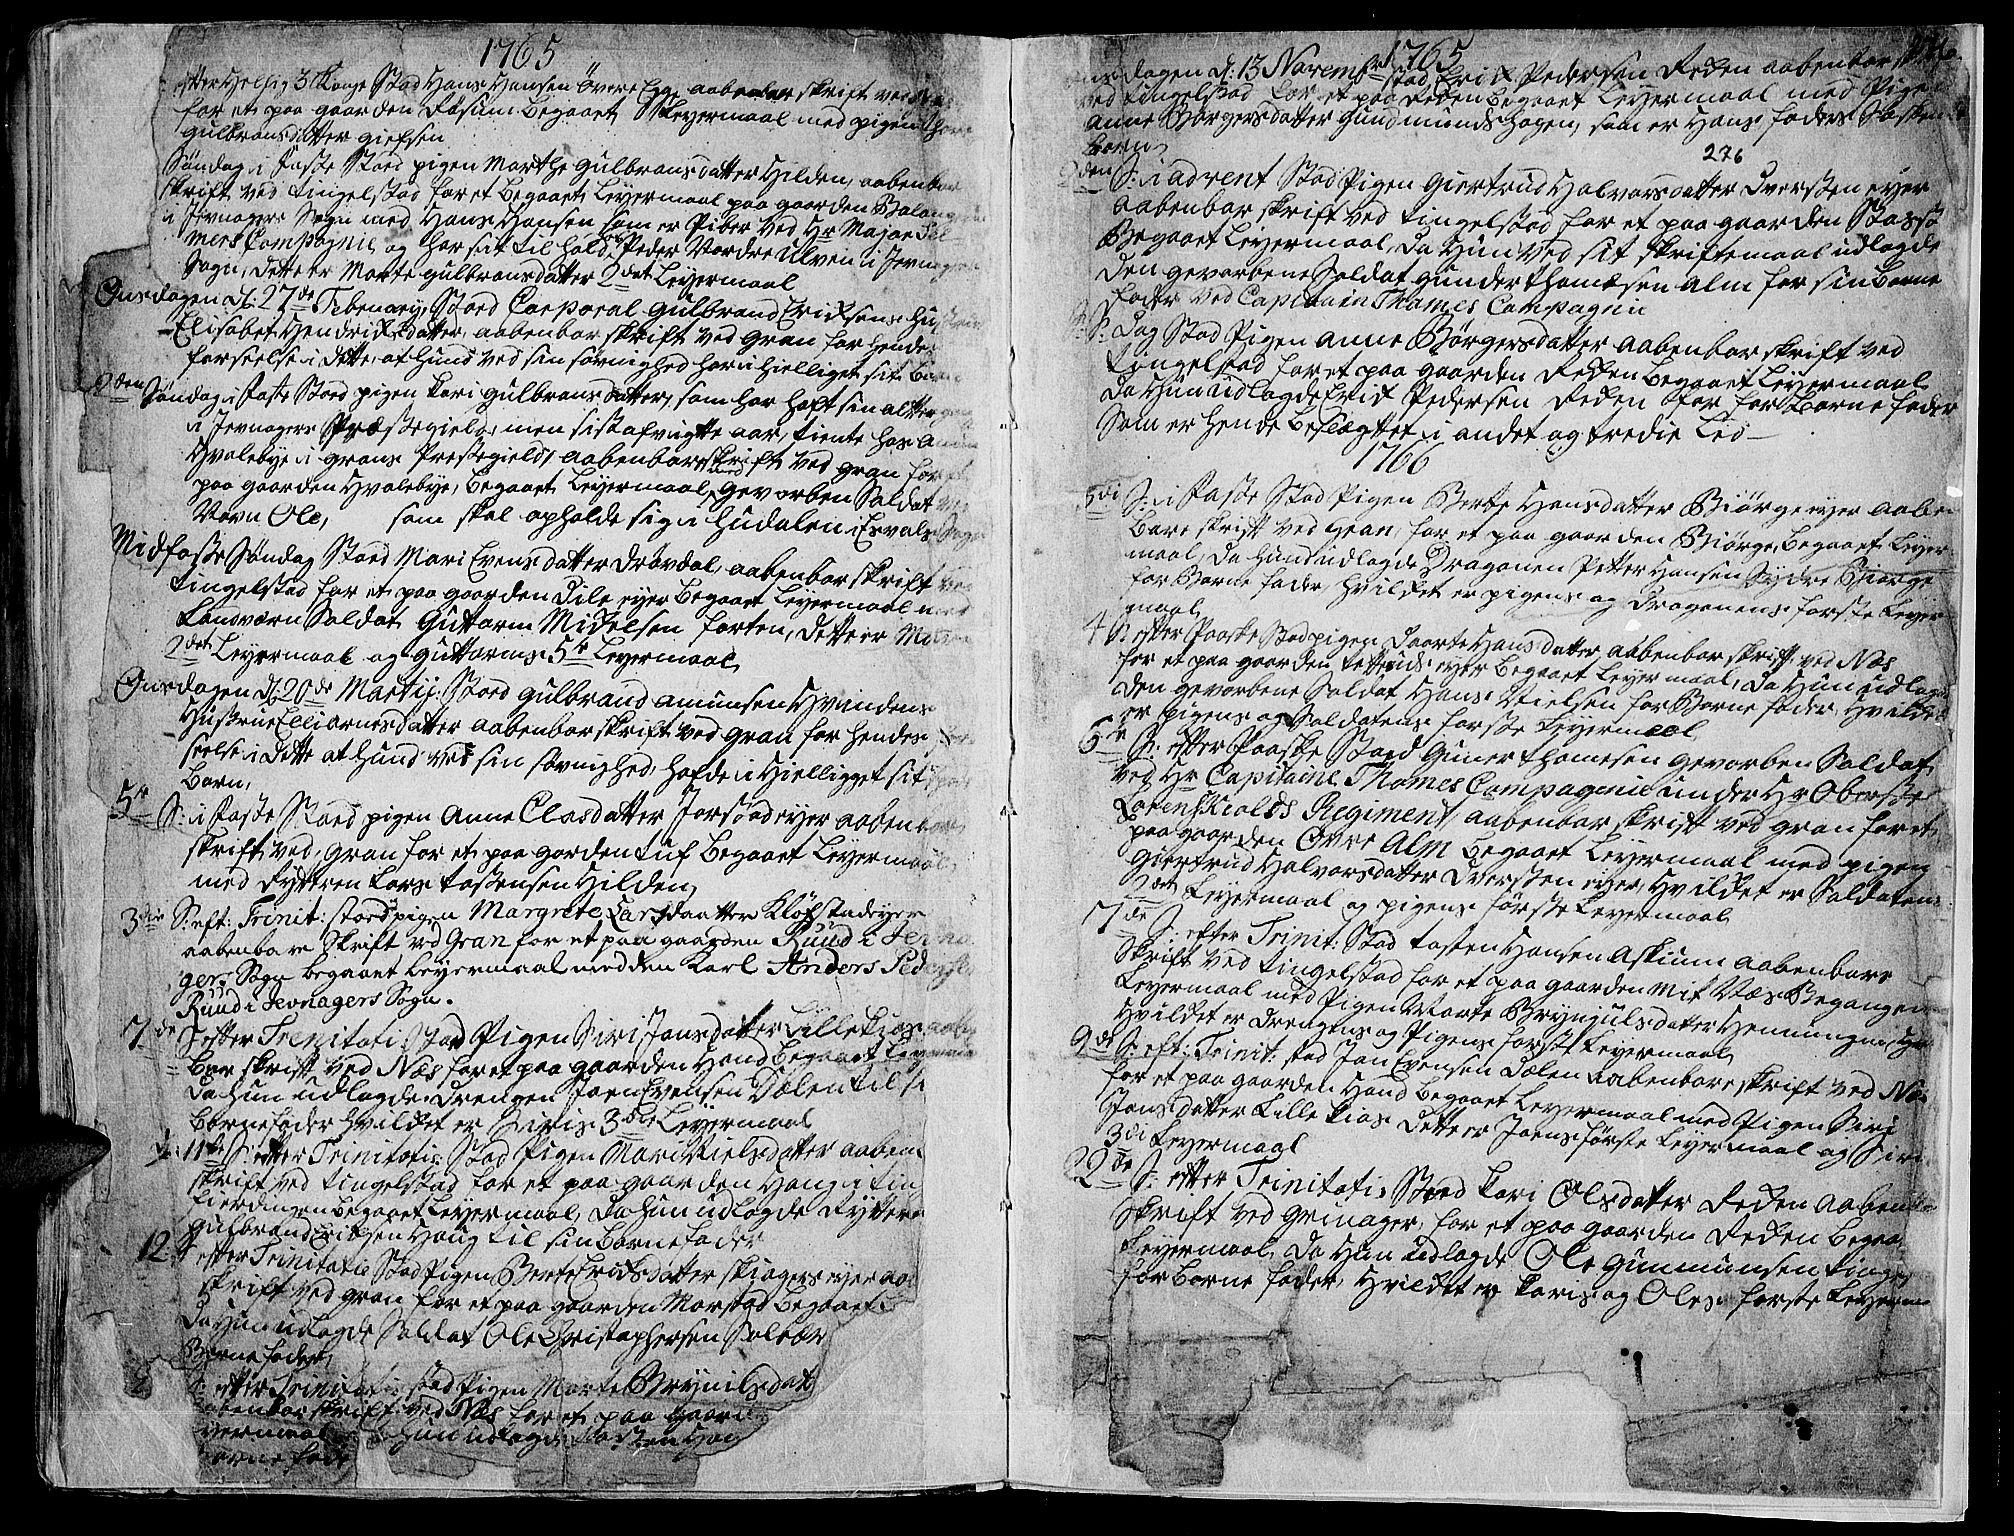 SAH, Gran prestekontor, Ministerialbok nr. 4, 1759-1775, s. 276